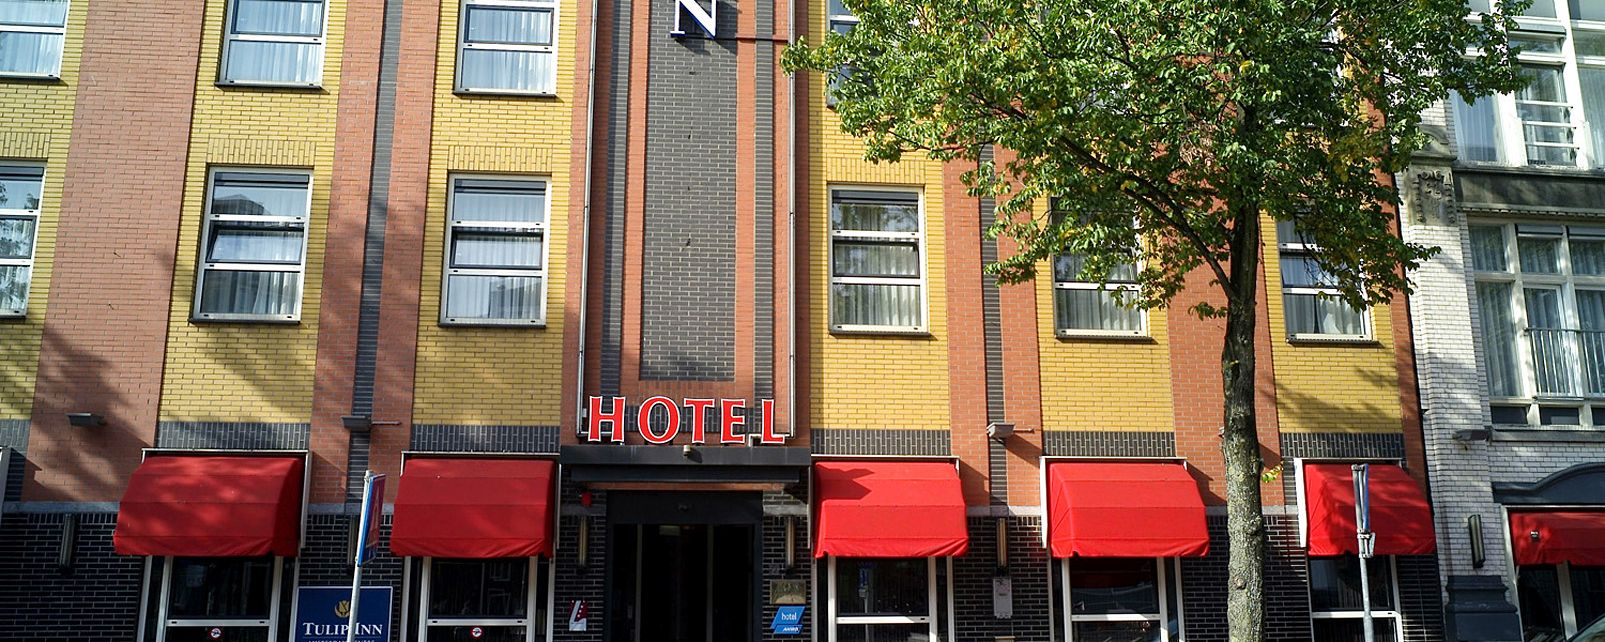 Hotel Tulip Inn City Centre